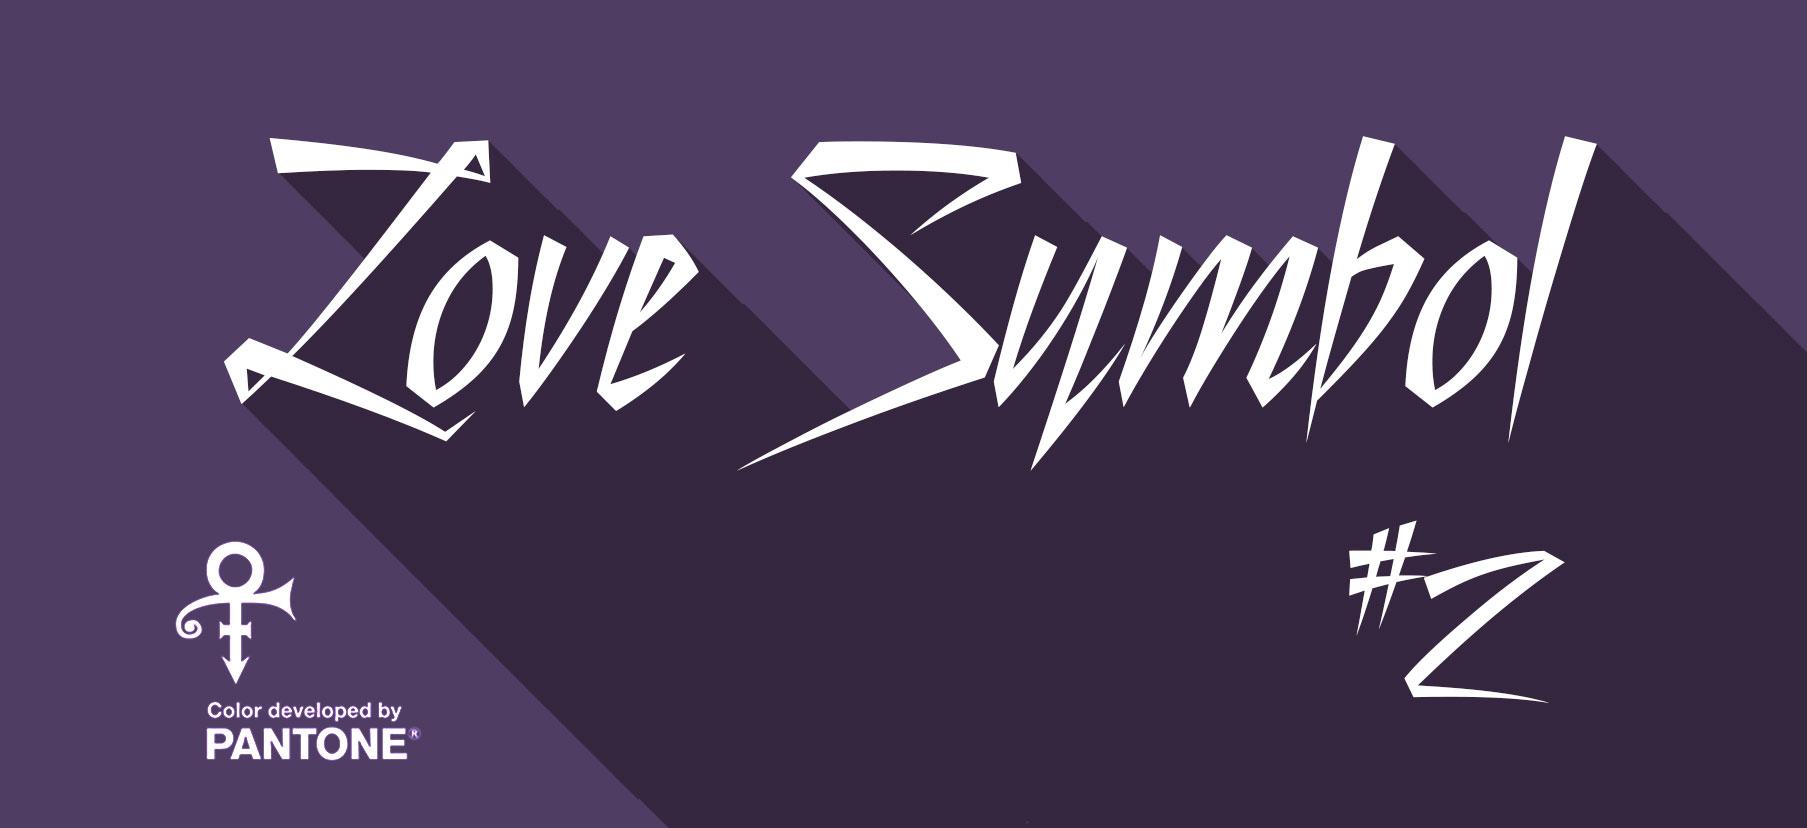 prince love symbol number 2 pantone color